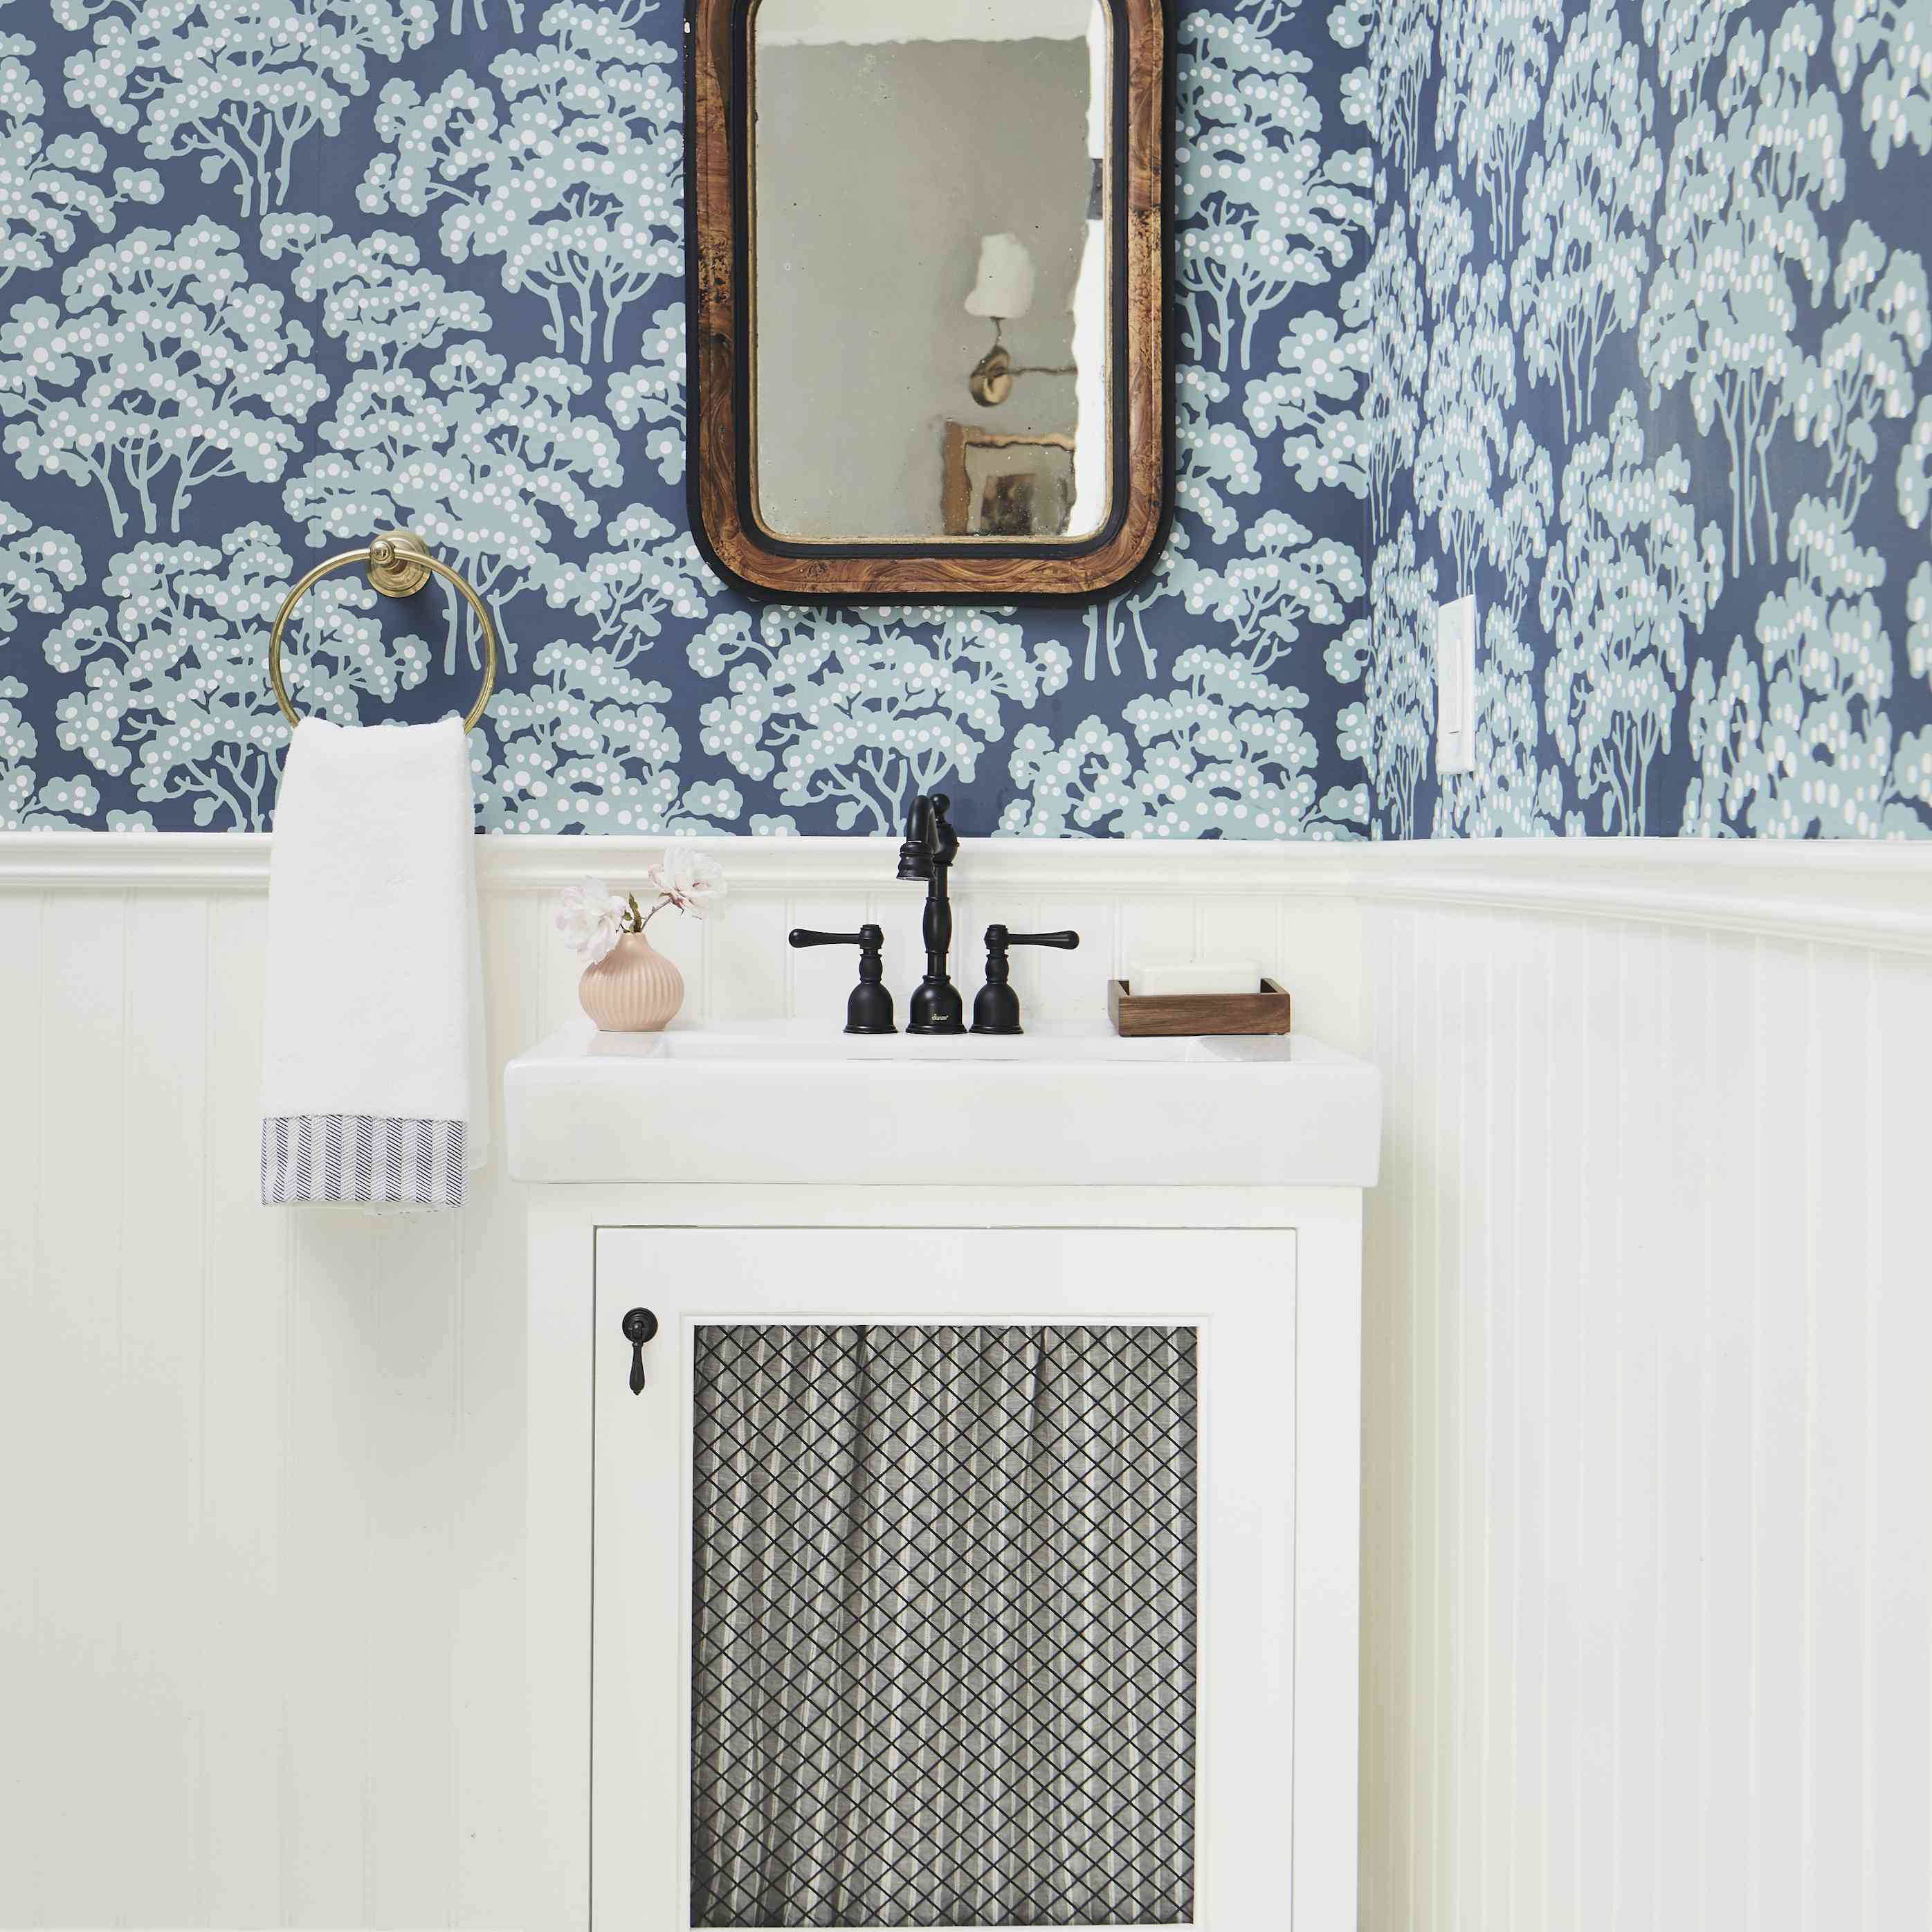 High contrast bathroom